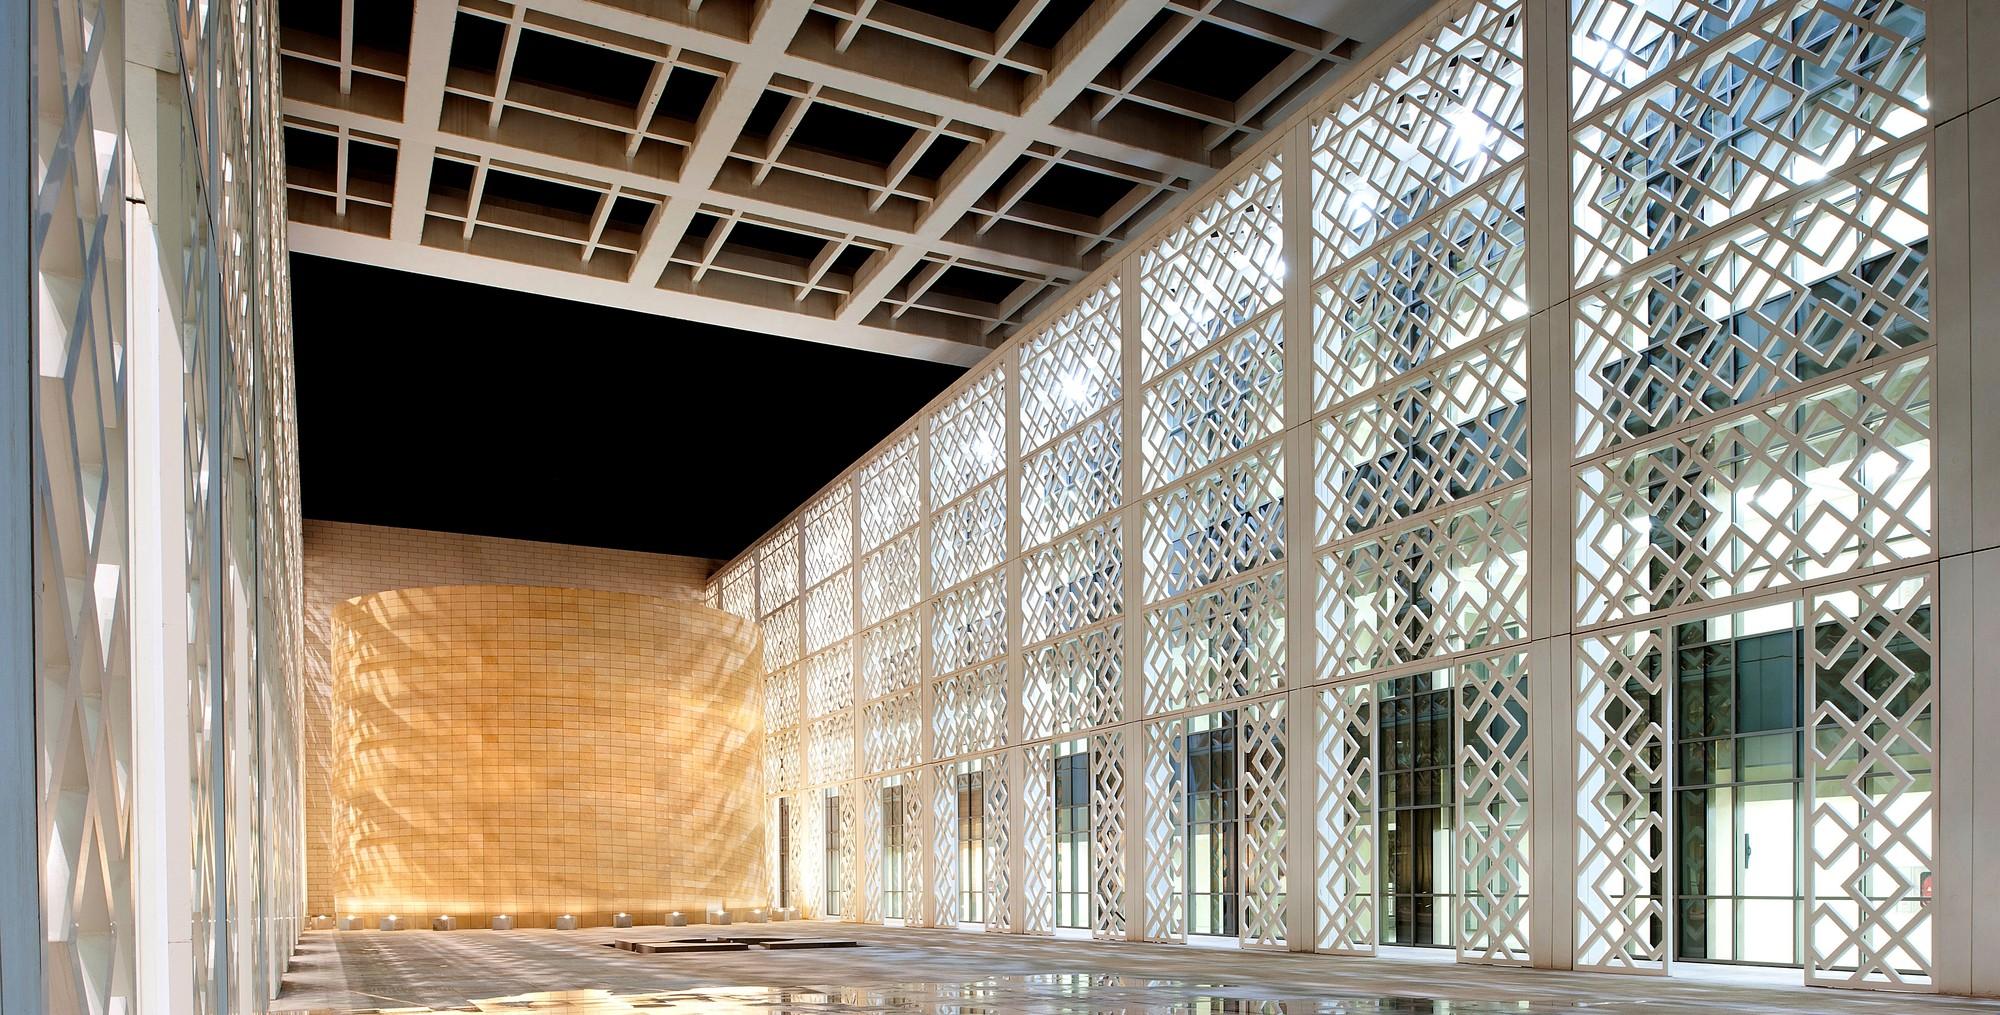 Gallery of princess nora bint abdulrahman university for Modern arabic house architecture